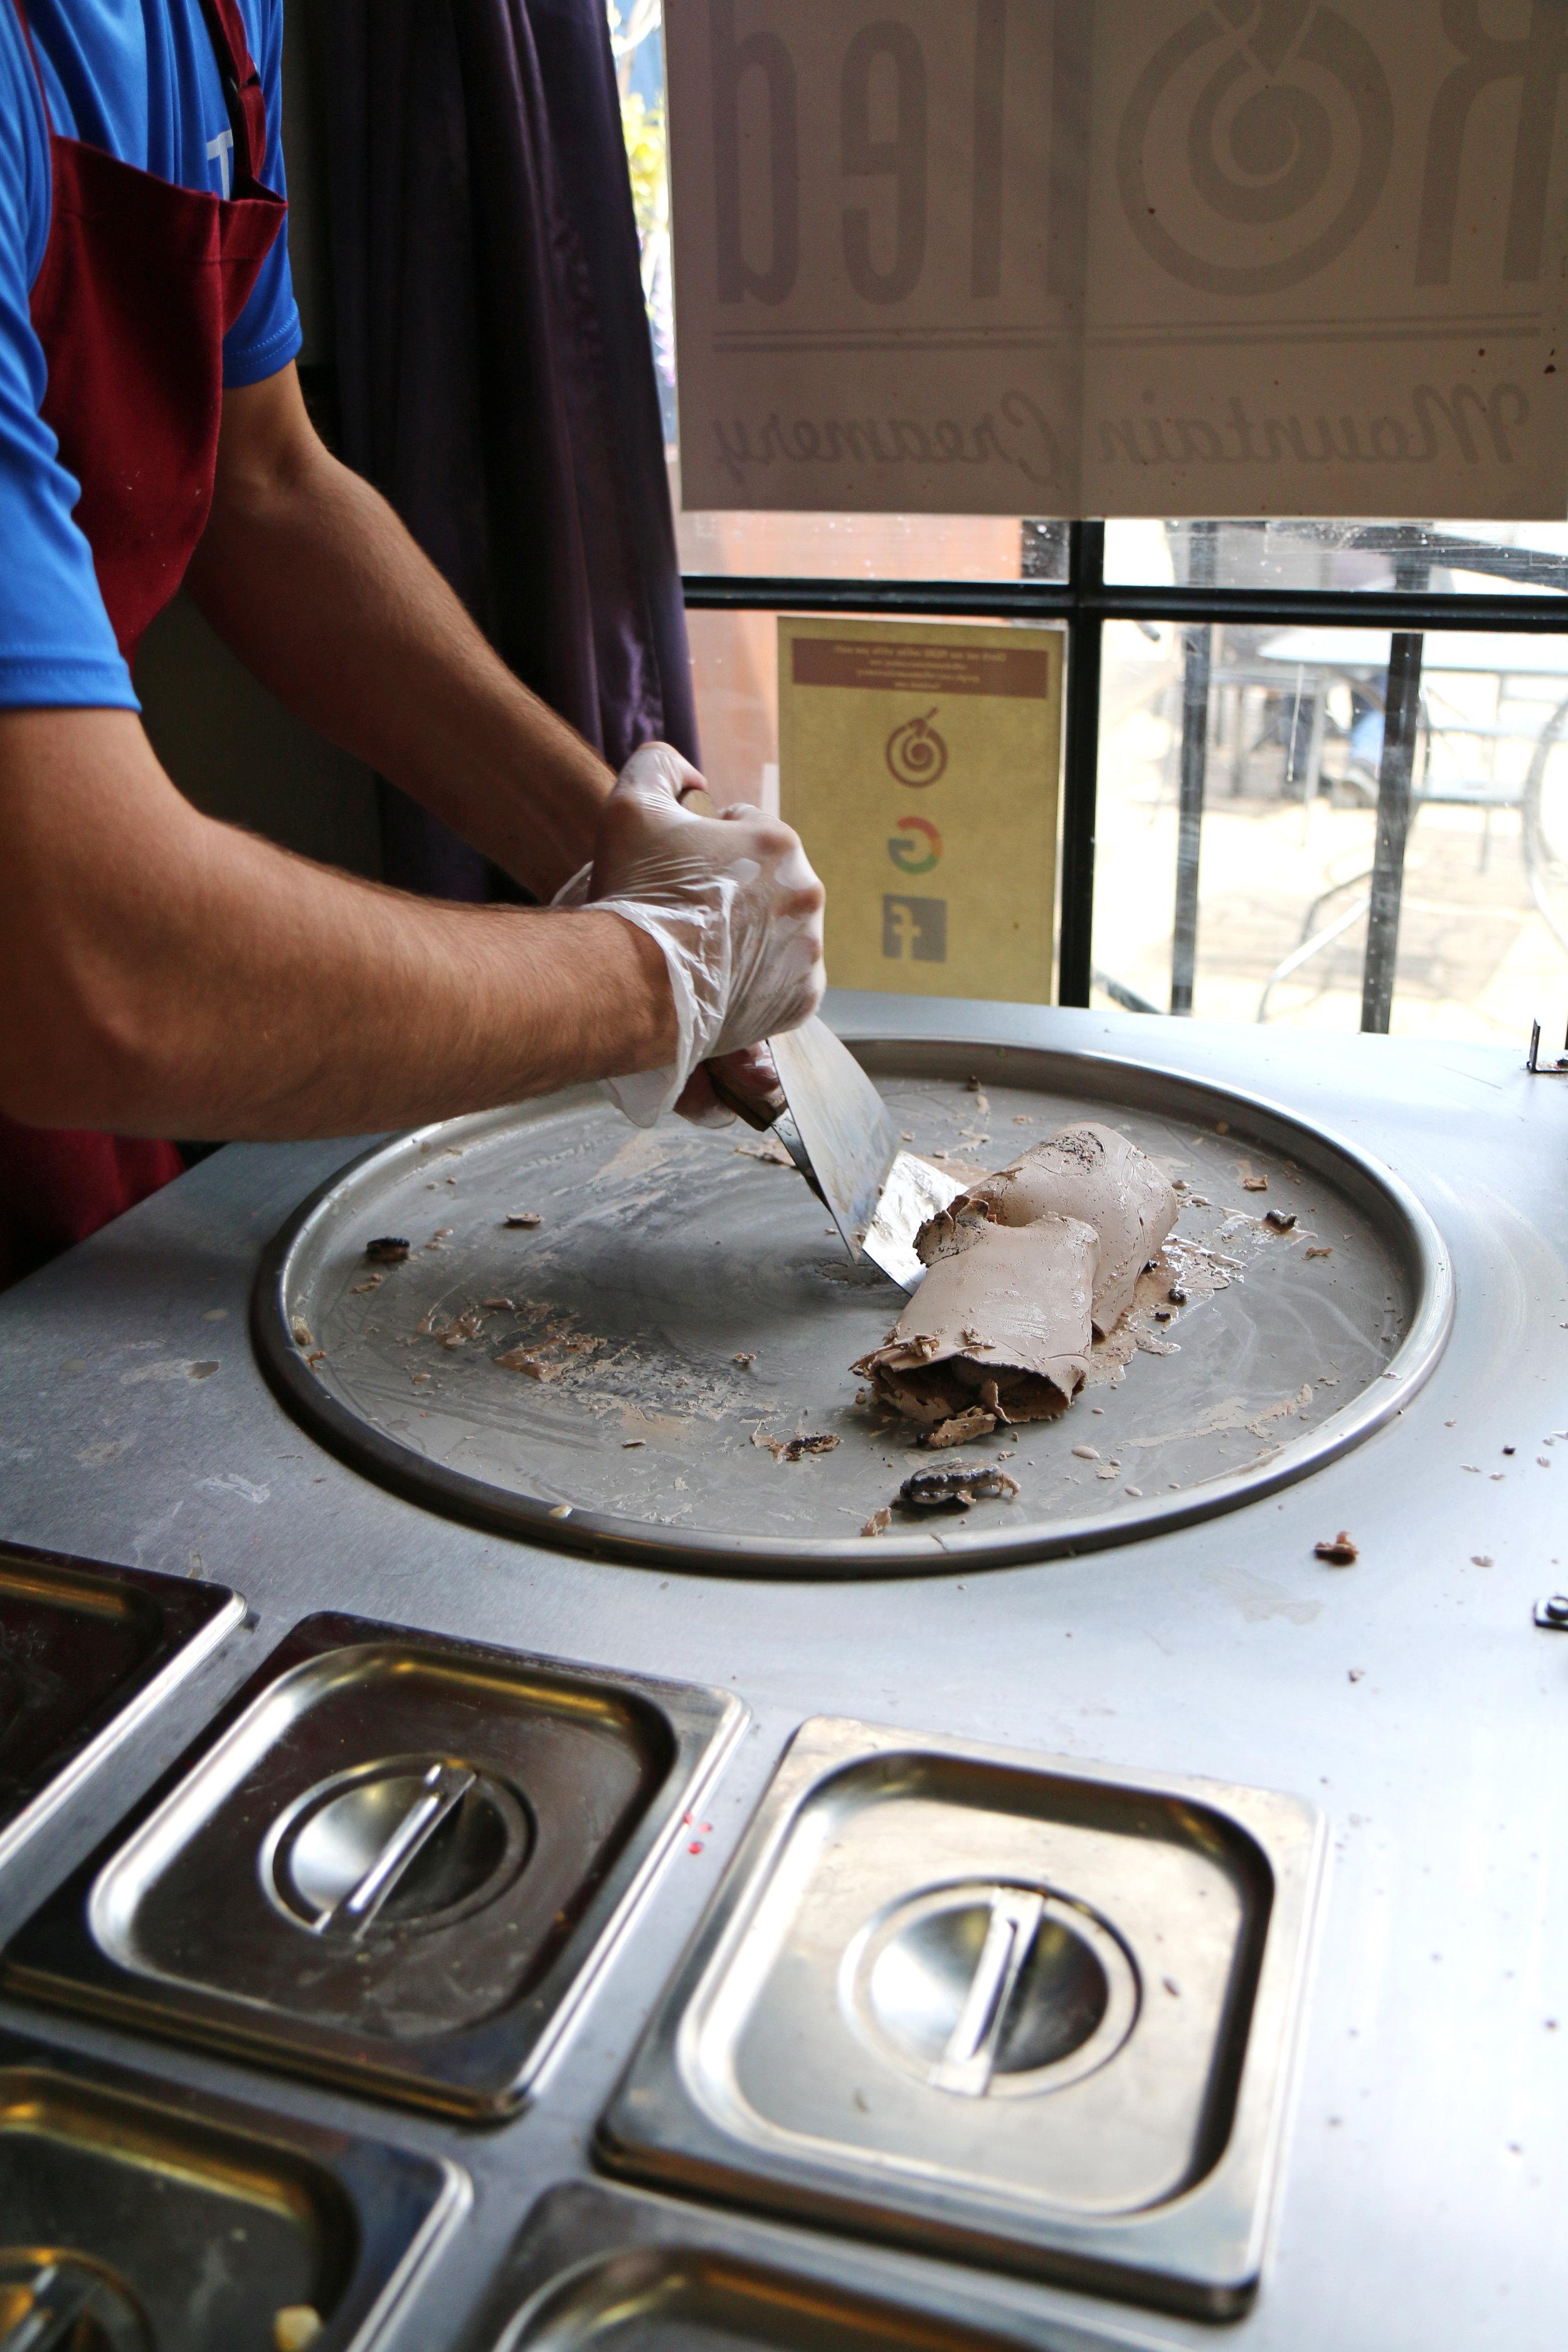 Rolled Mountain Creamery in Reno, Nevada. The BEST rolled ice cream inside Dorinda's Chocolates.